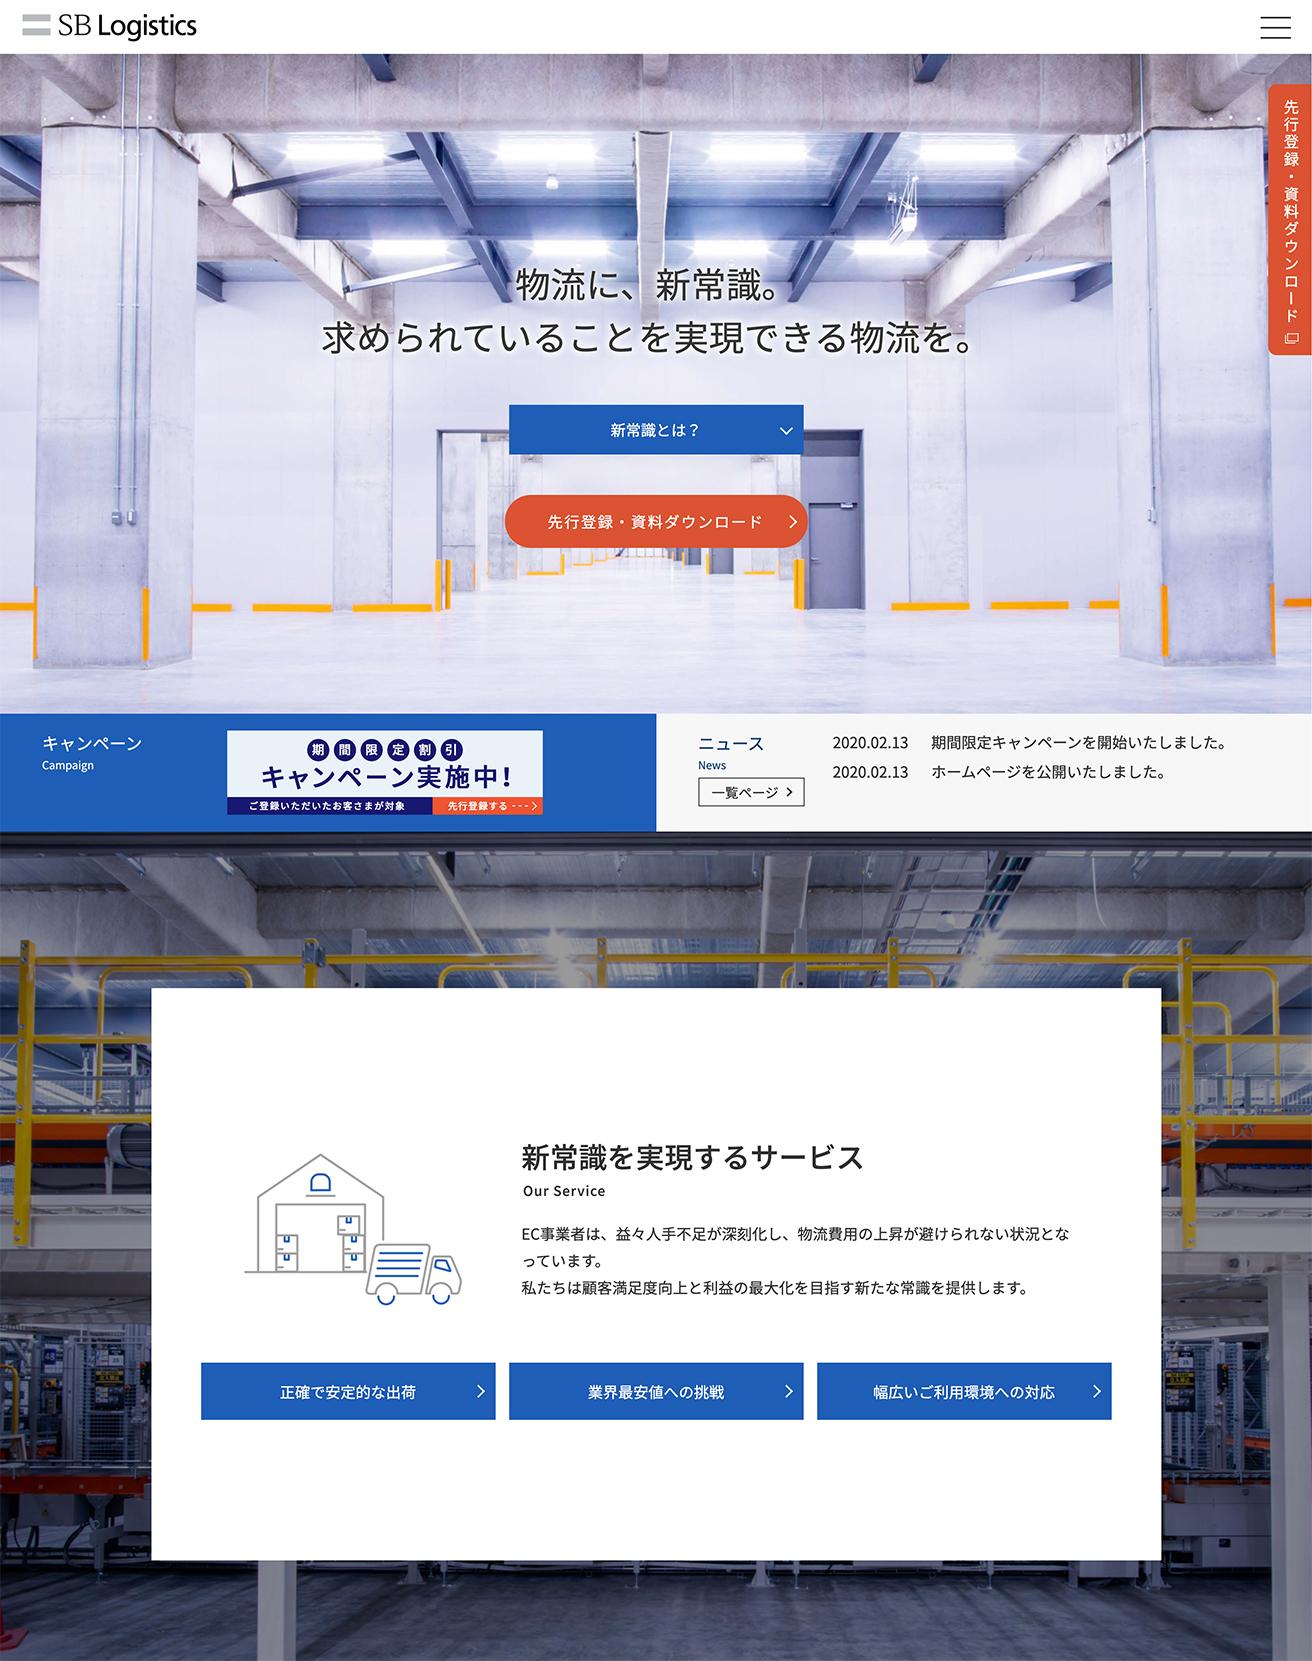 SBロジスティクス株式会社トップページ